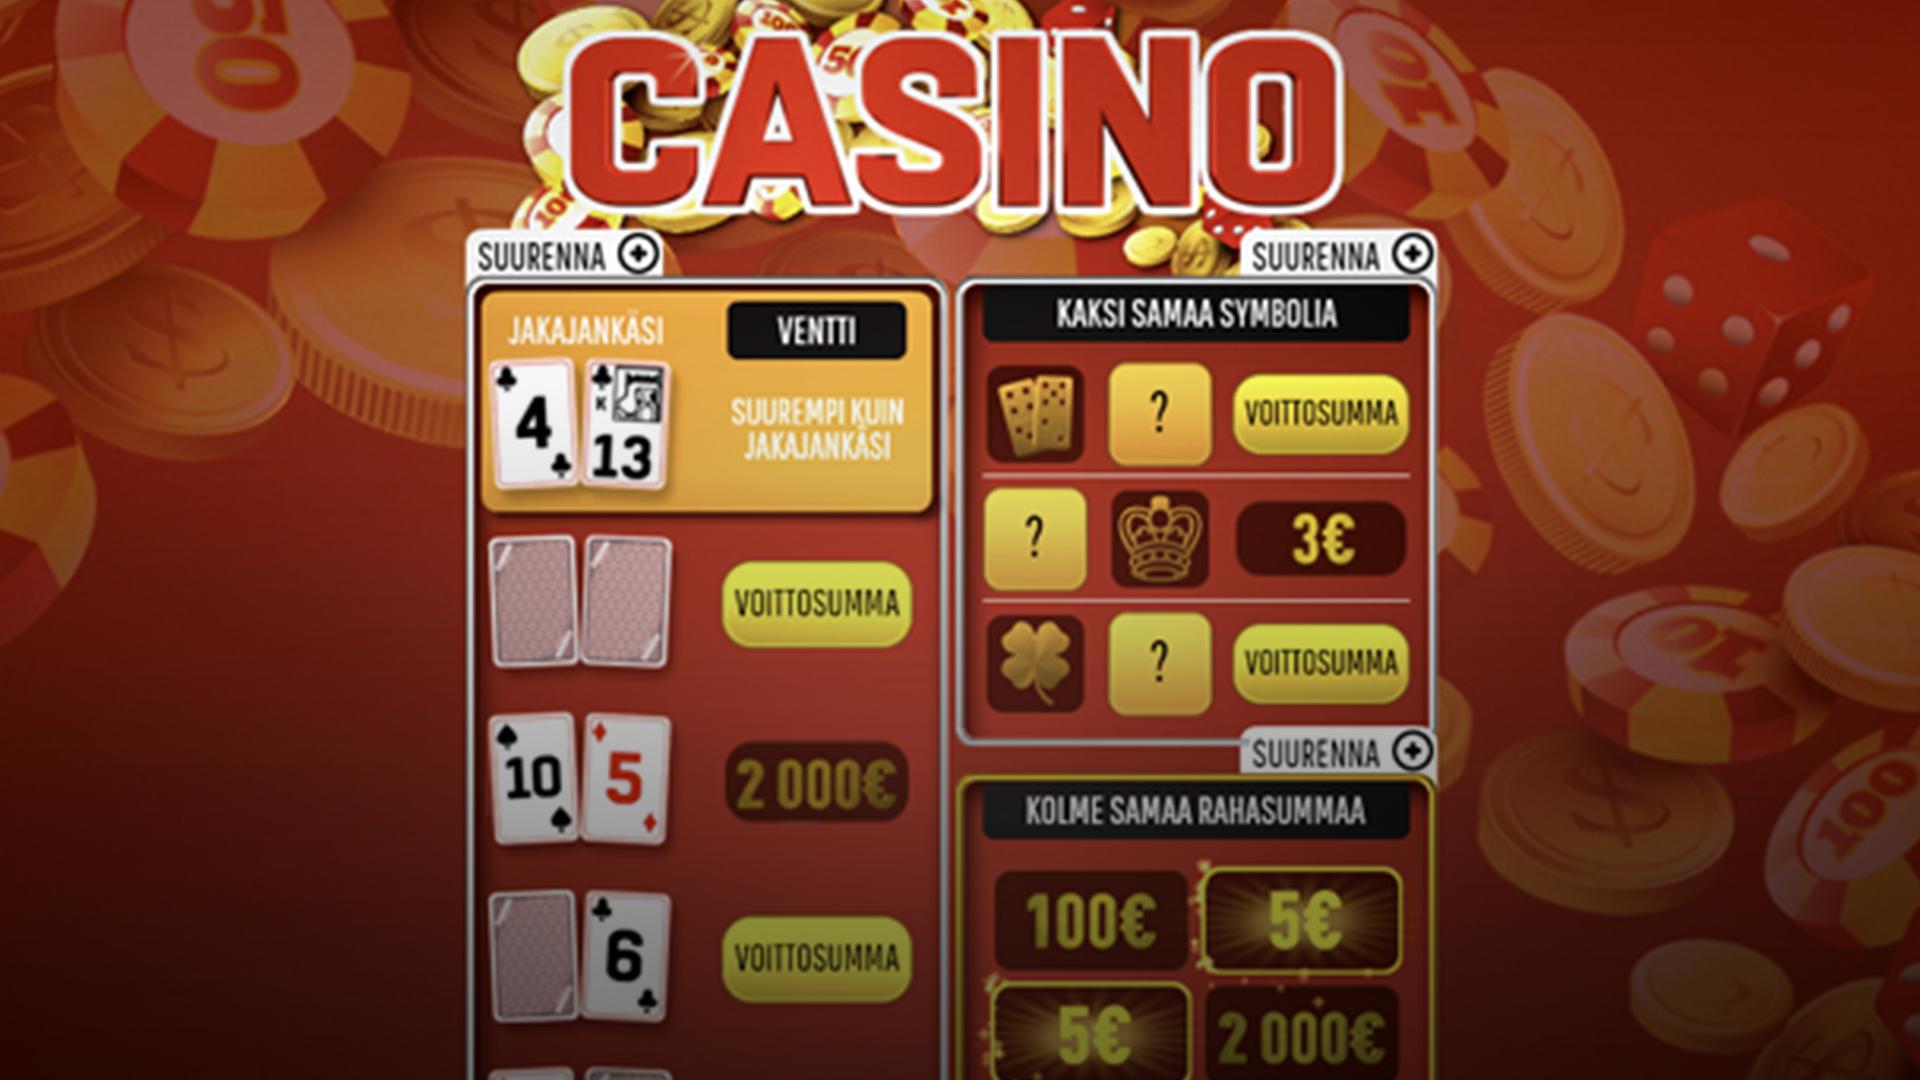 Casino arpa